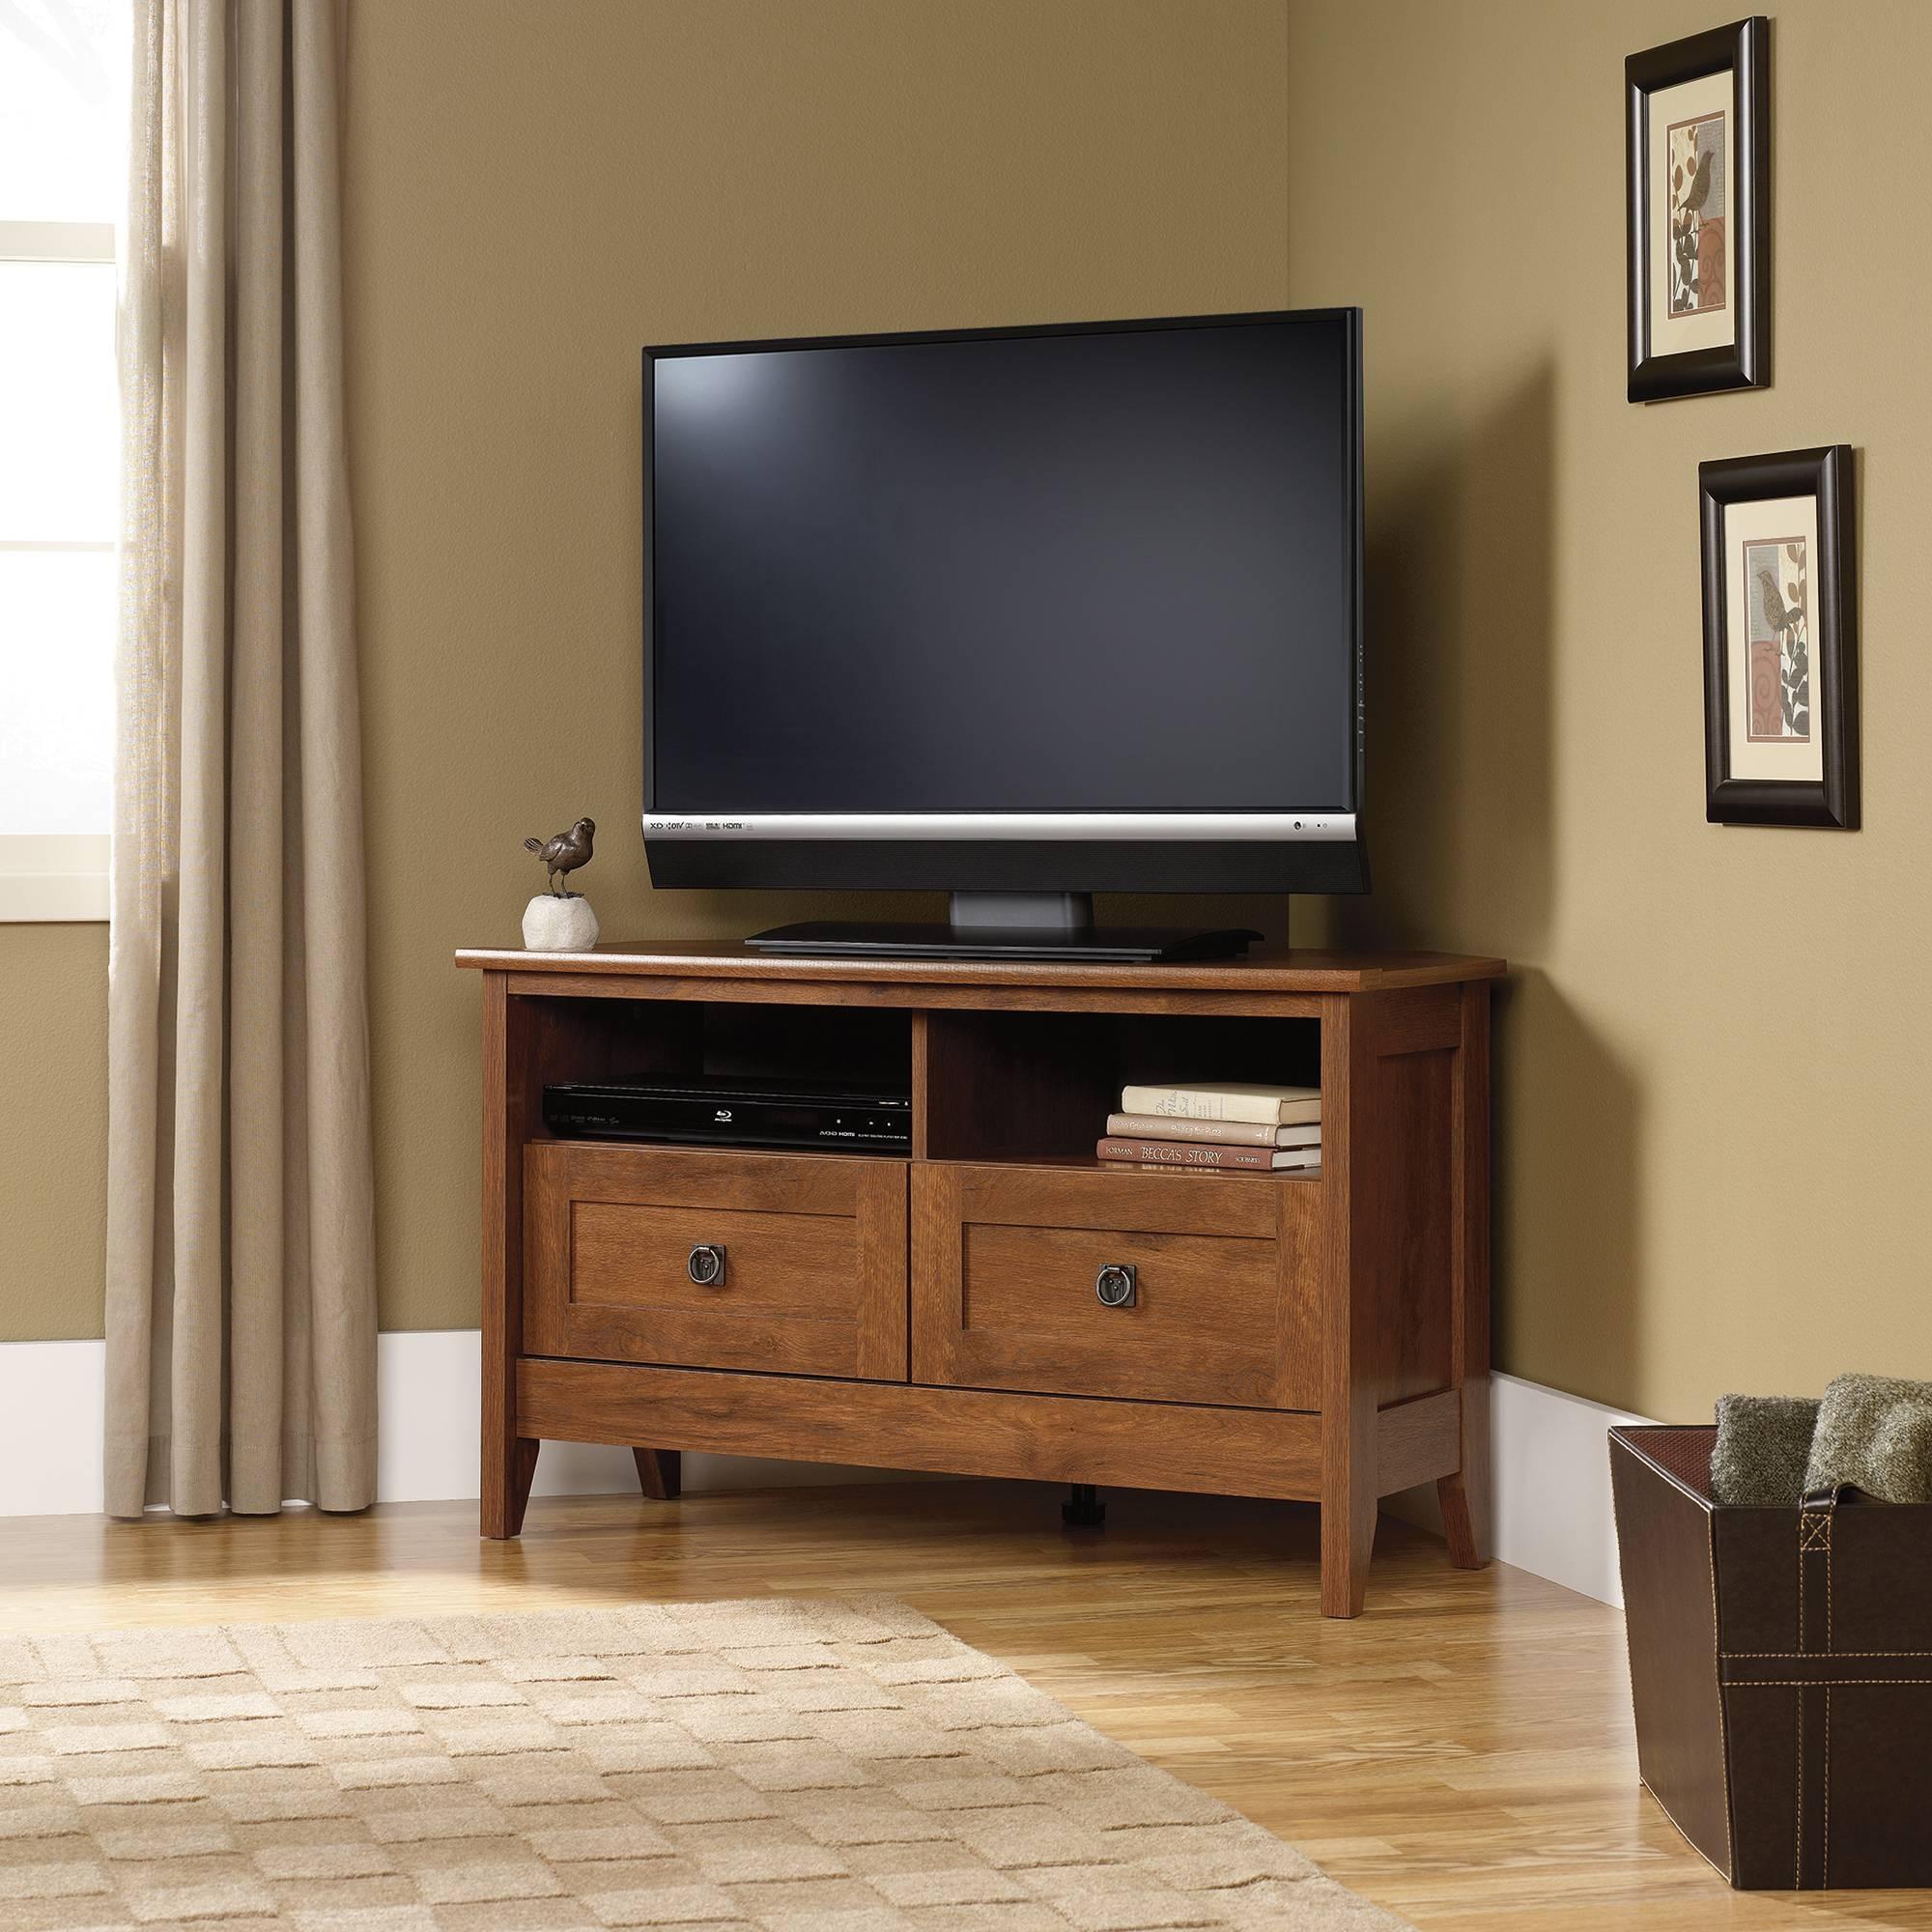 Sauder Select | Corner Tv Stand | 410627 | Sauder Regarding Small Oak Corner Tv Stands (View 6 of 15)